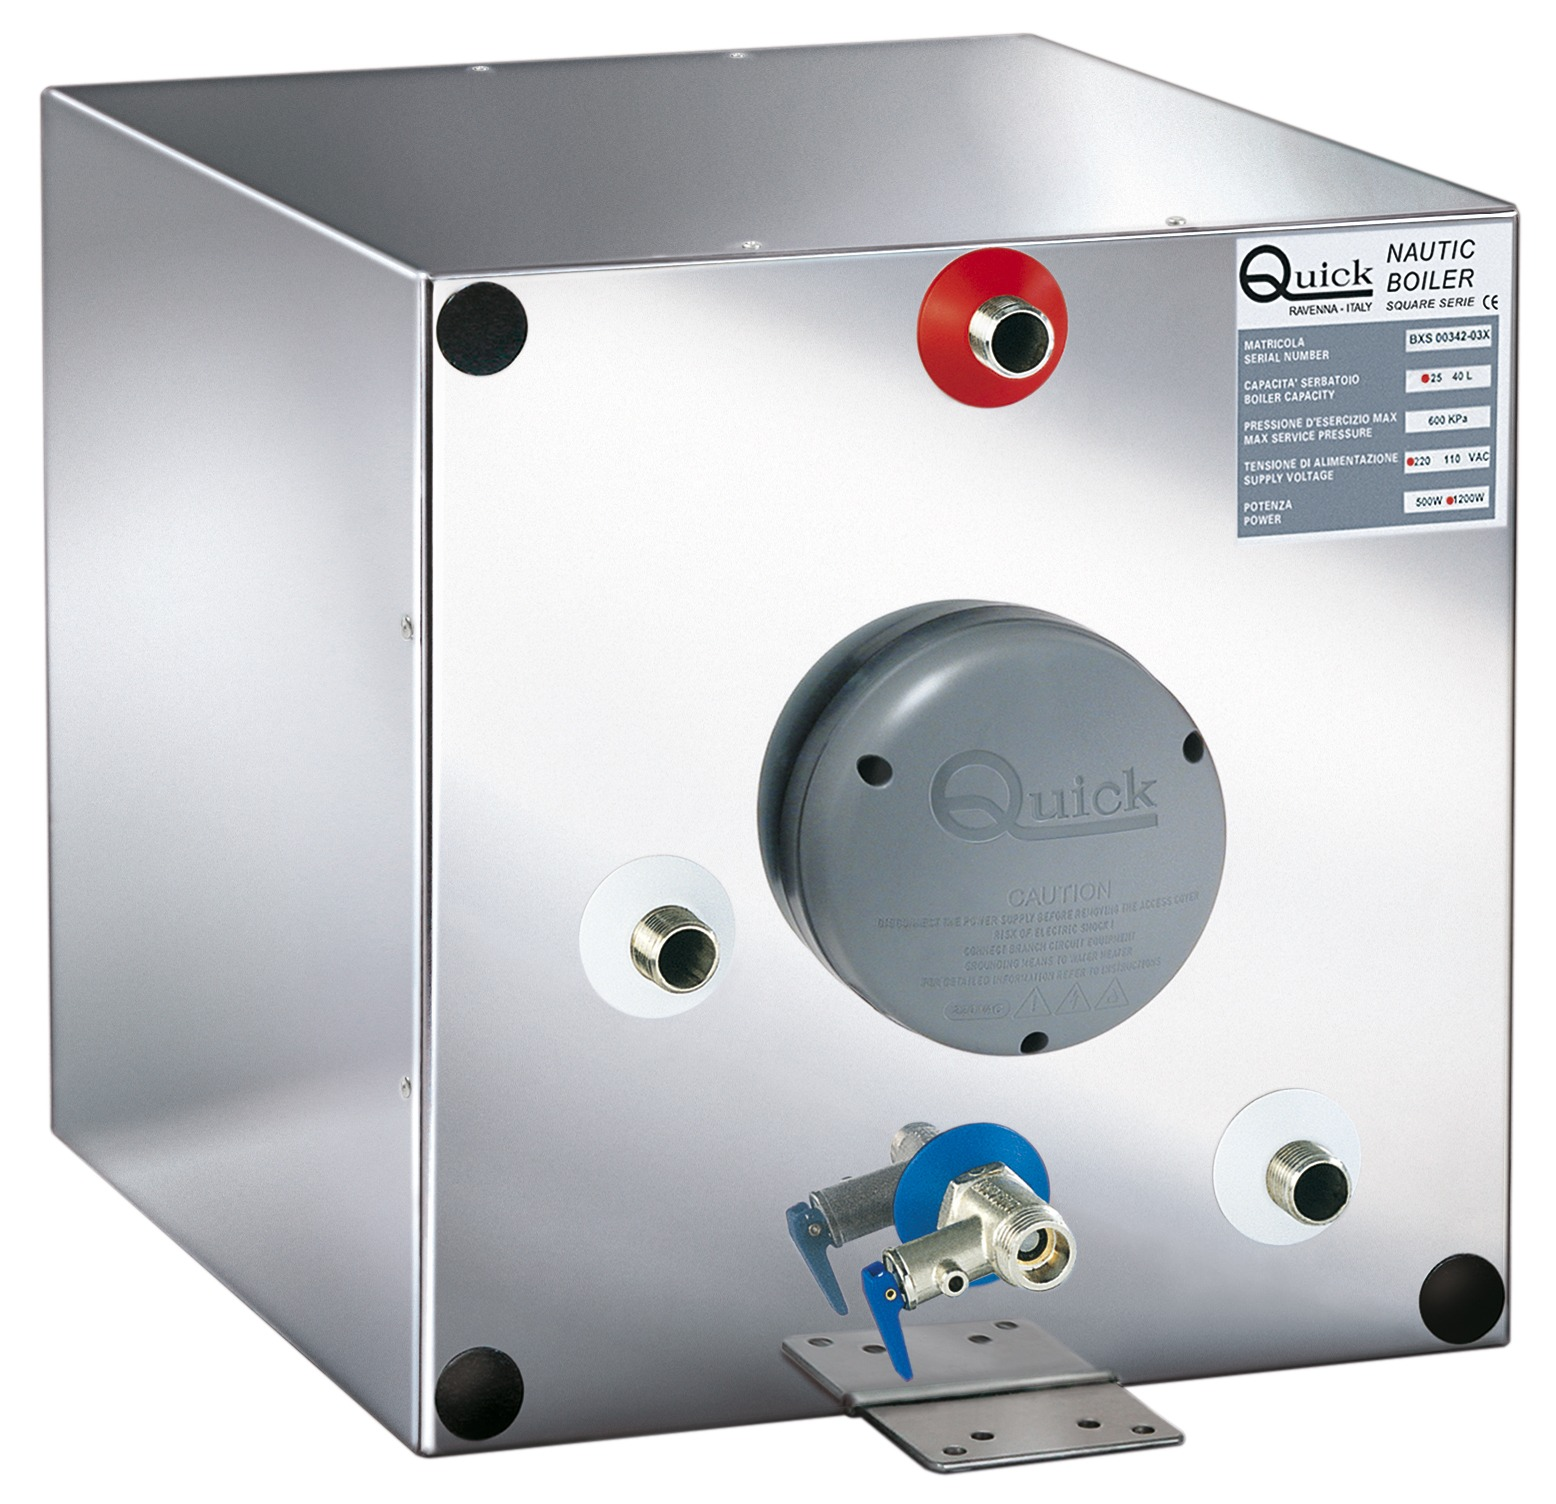 6.6 Gal 220 Volt  BXS Nautic Boiler